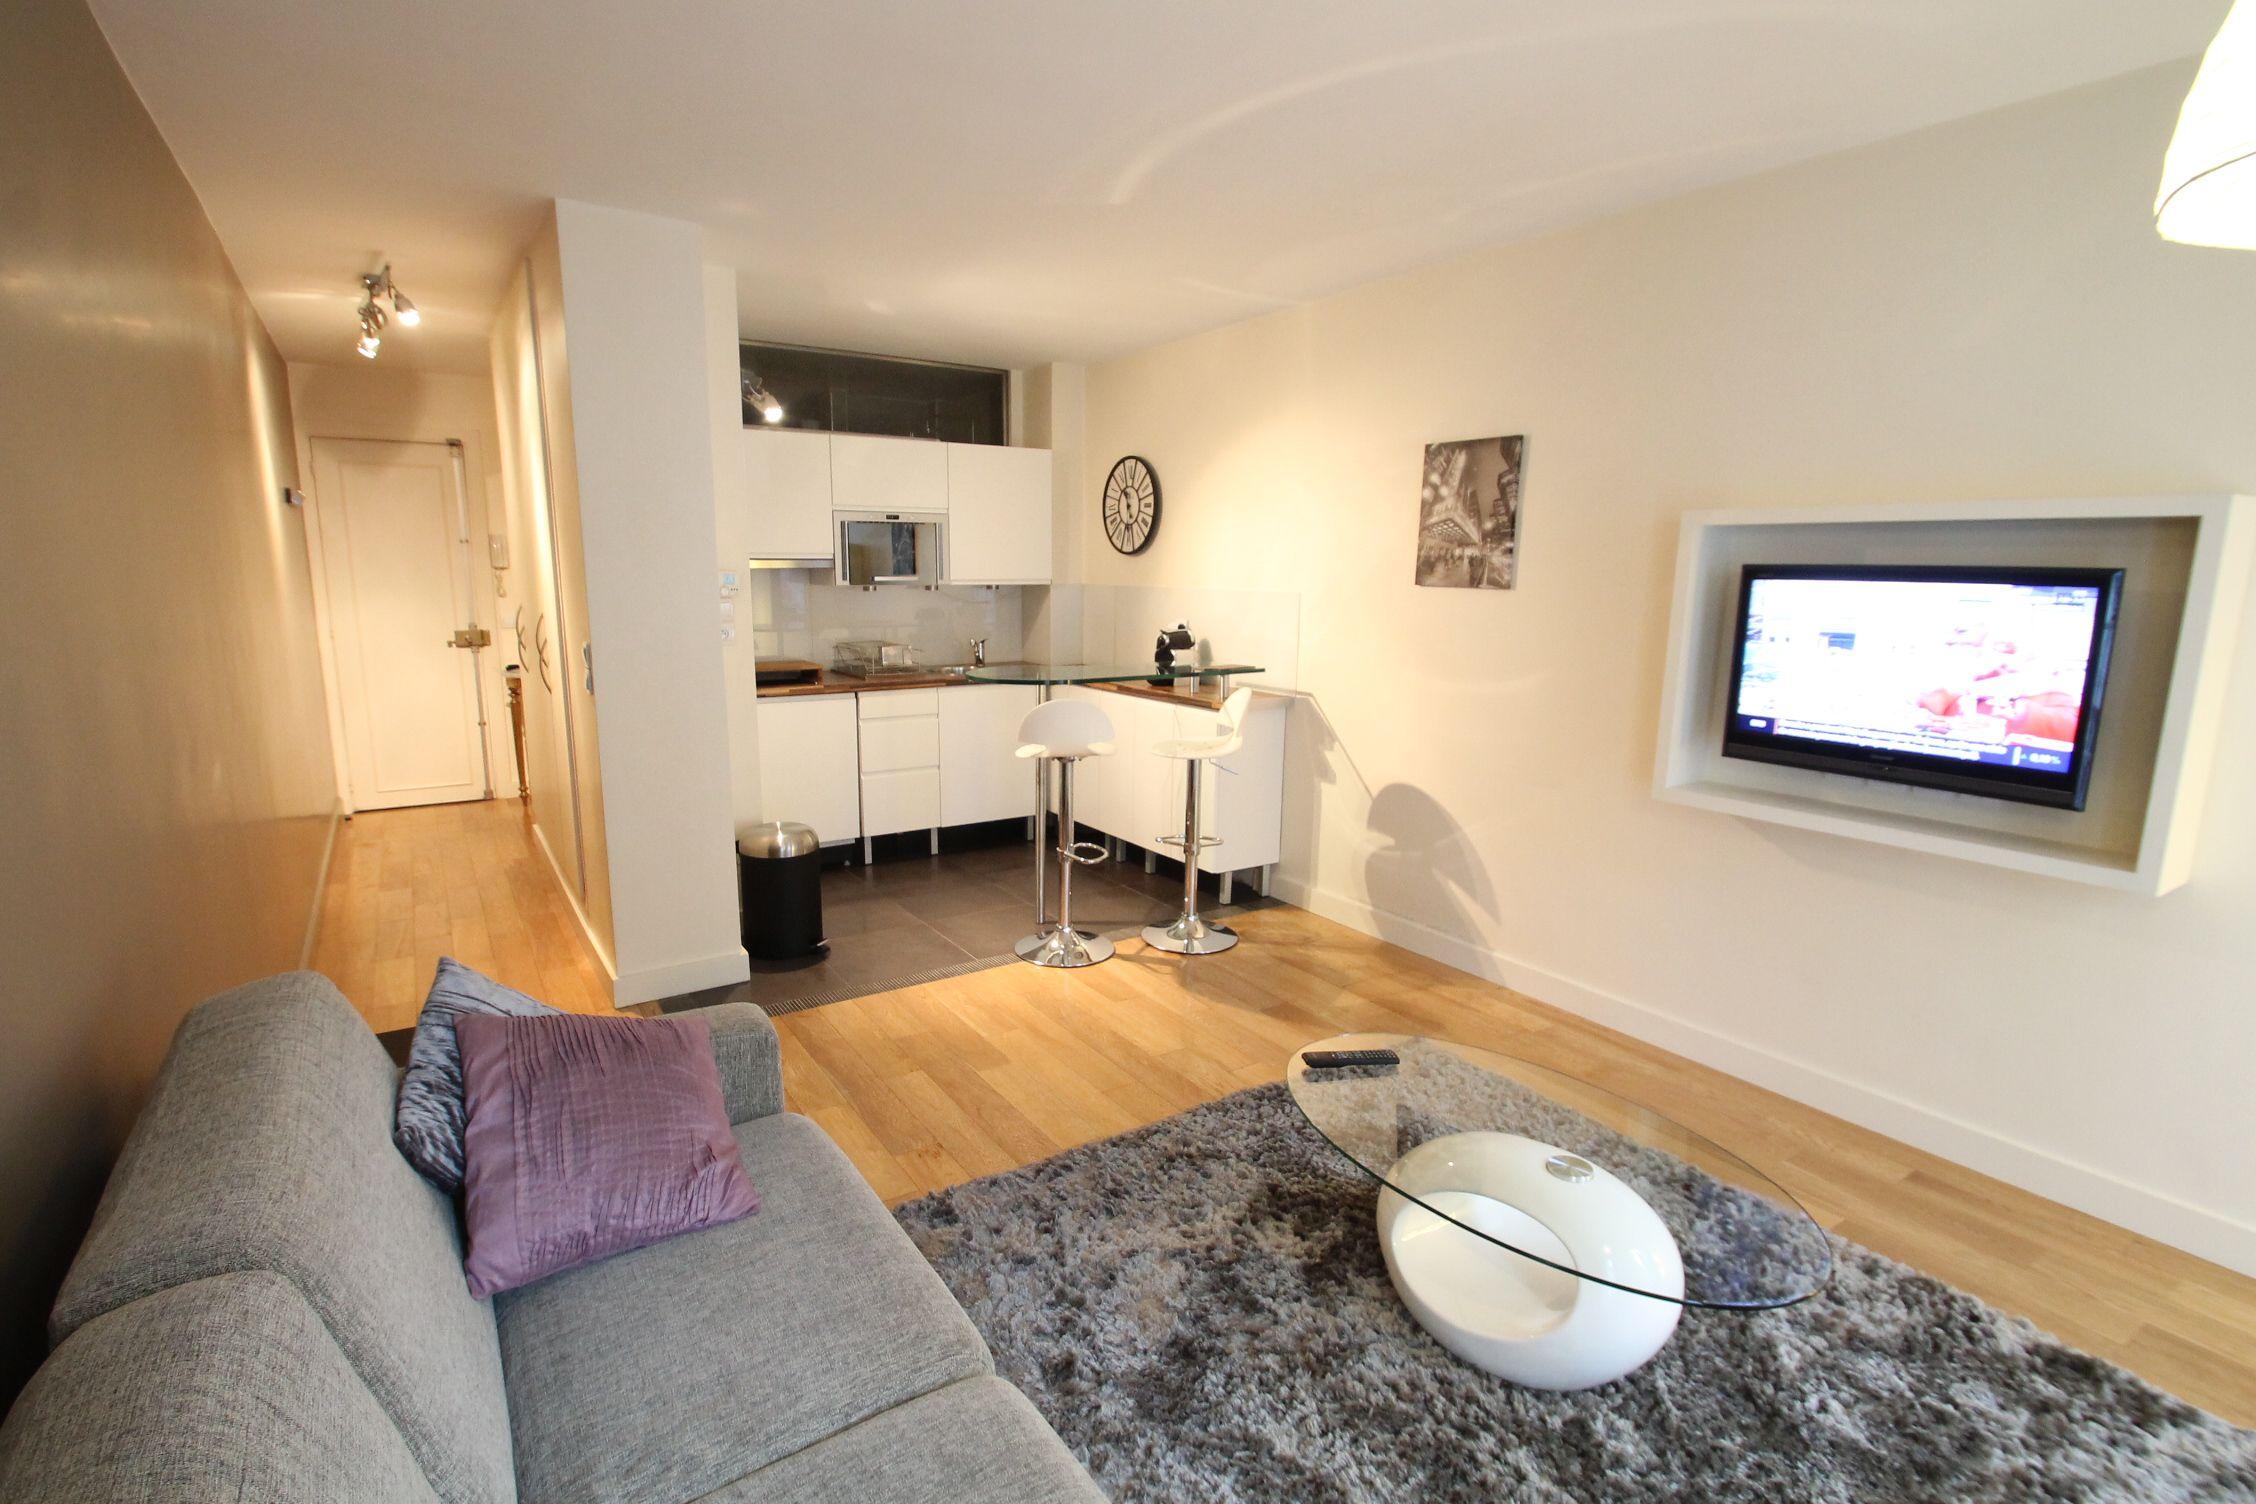 Location Studio Meuble 29m Paris 6eme Proche Luxembourg Agence Immobiliere Studio Meuble Location Appartement